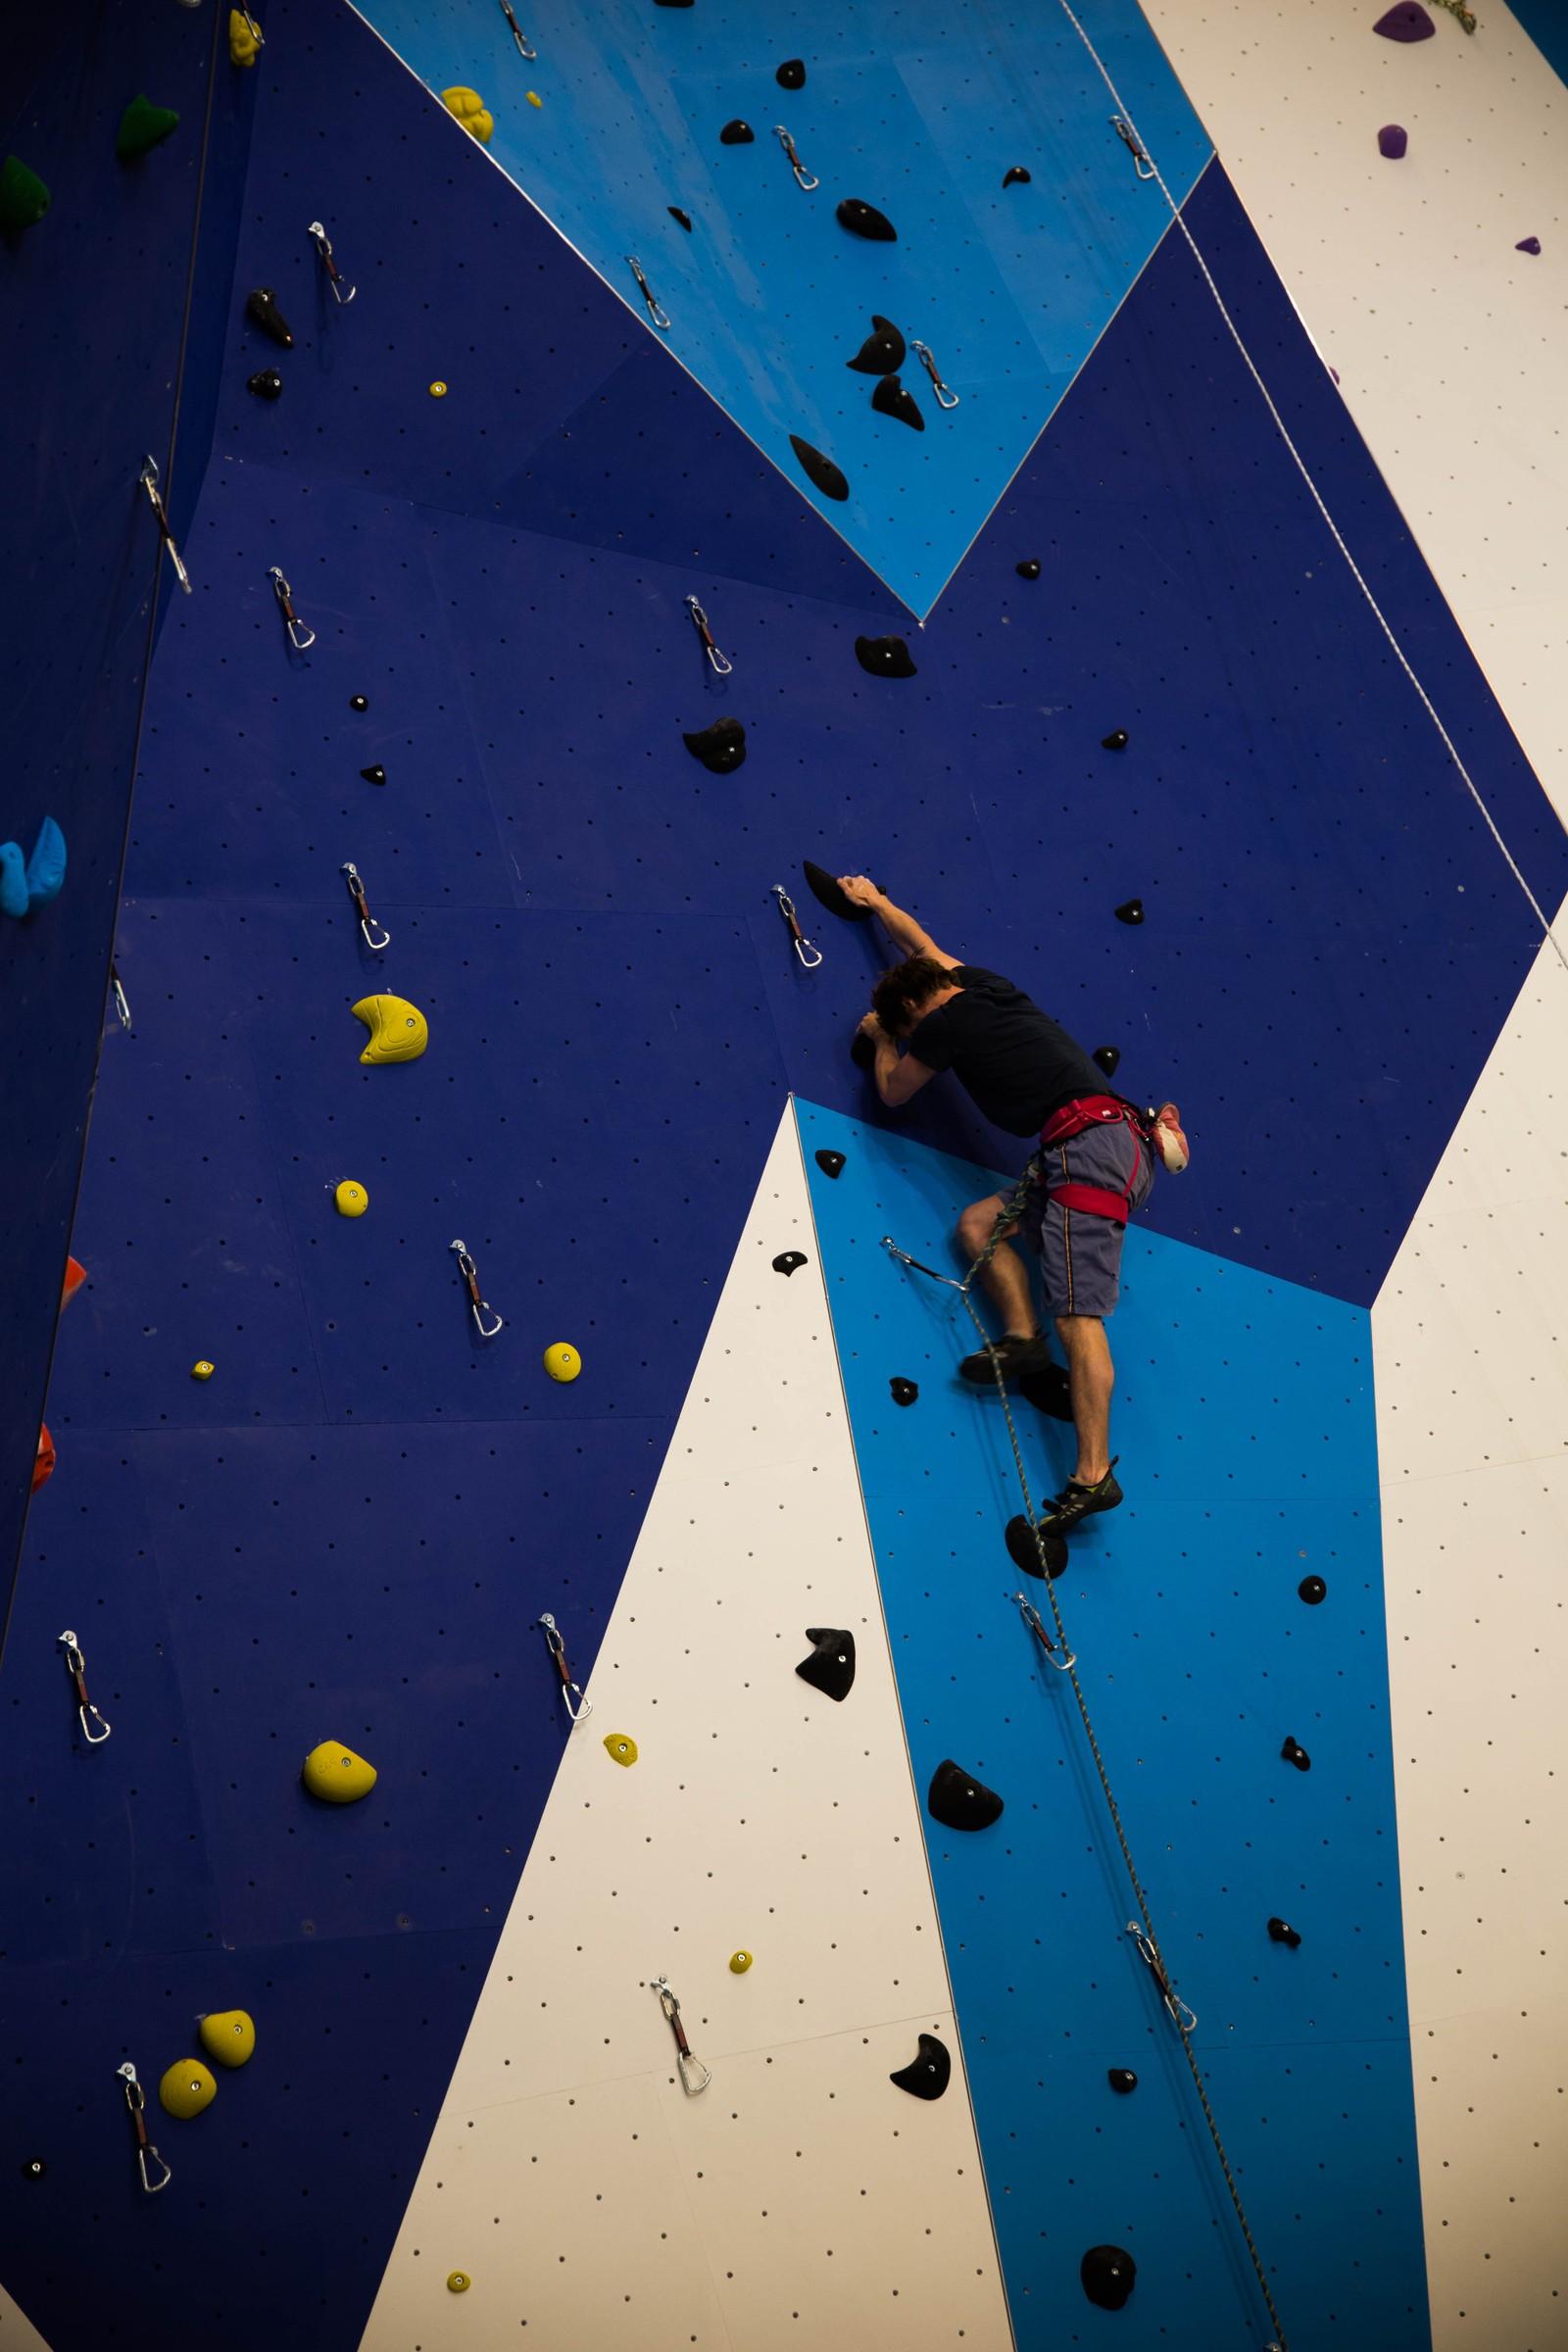 Man kan klatre høyt, høyt, høyt.